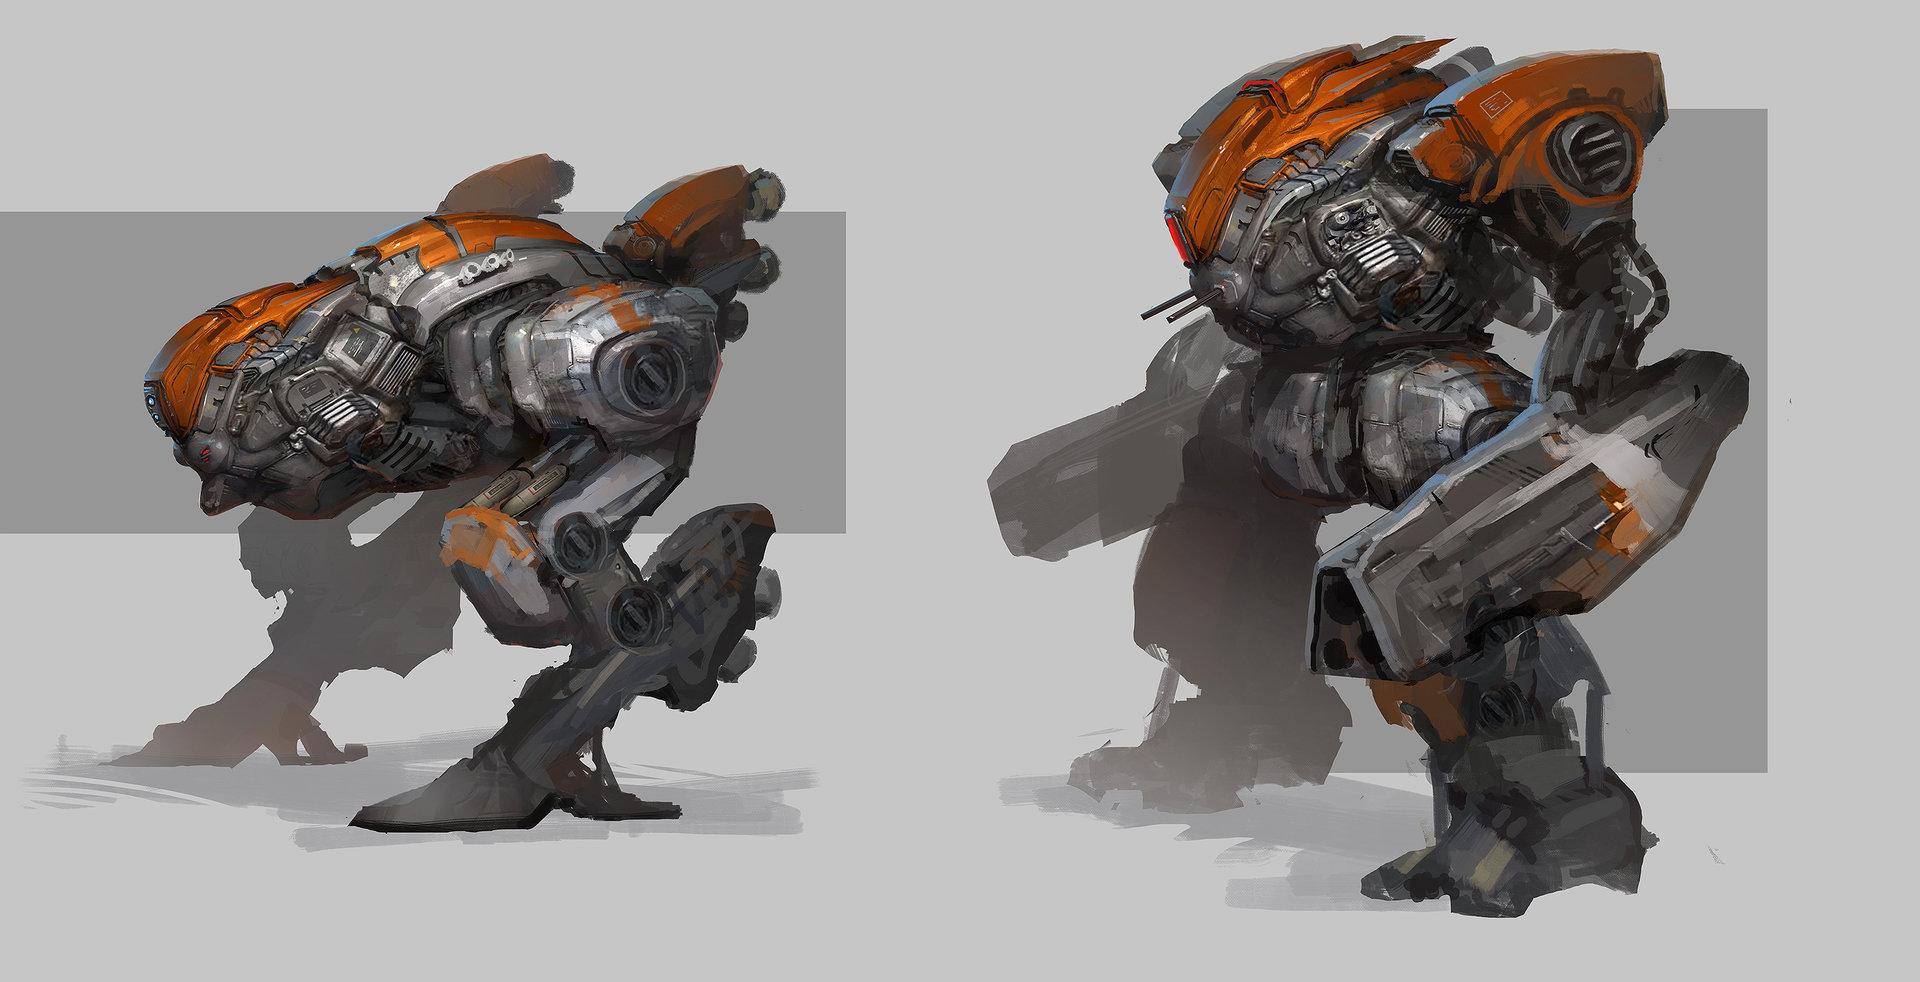 muyoung-kim-mech-sketches-2